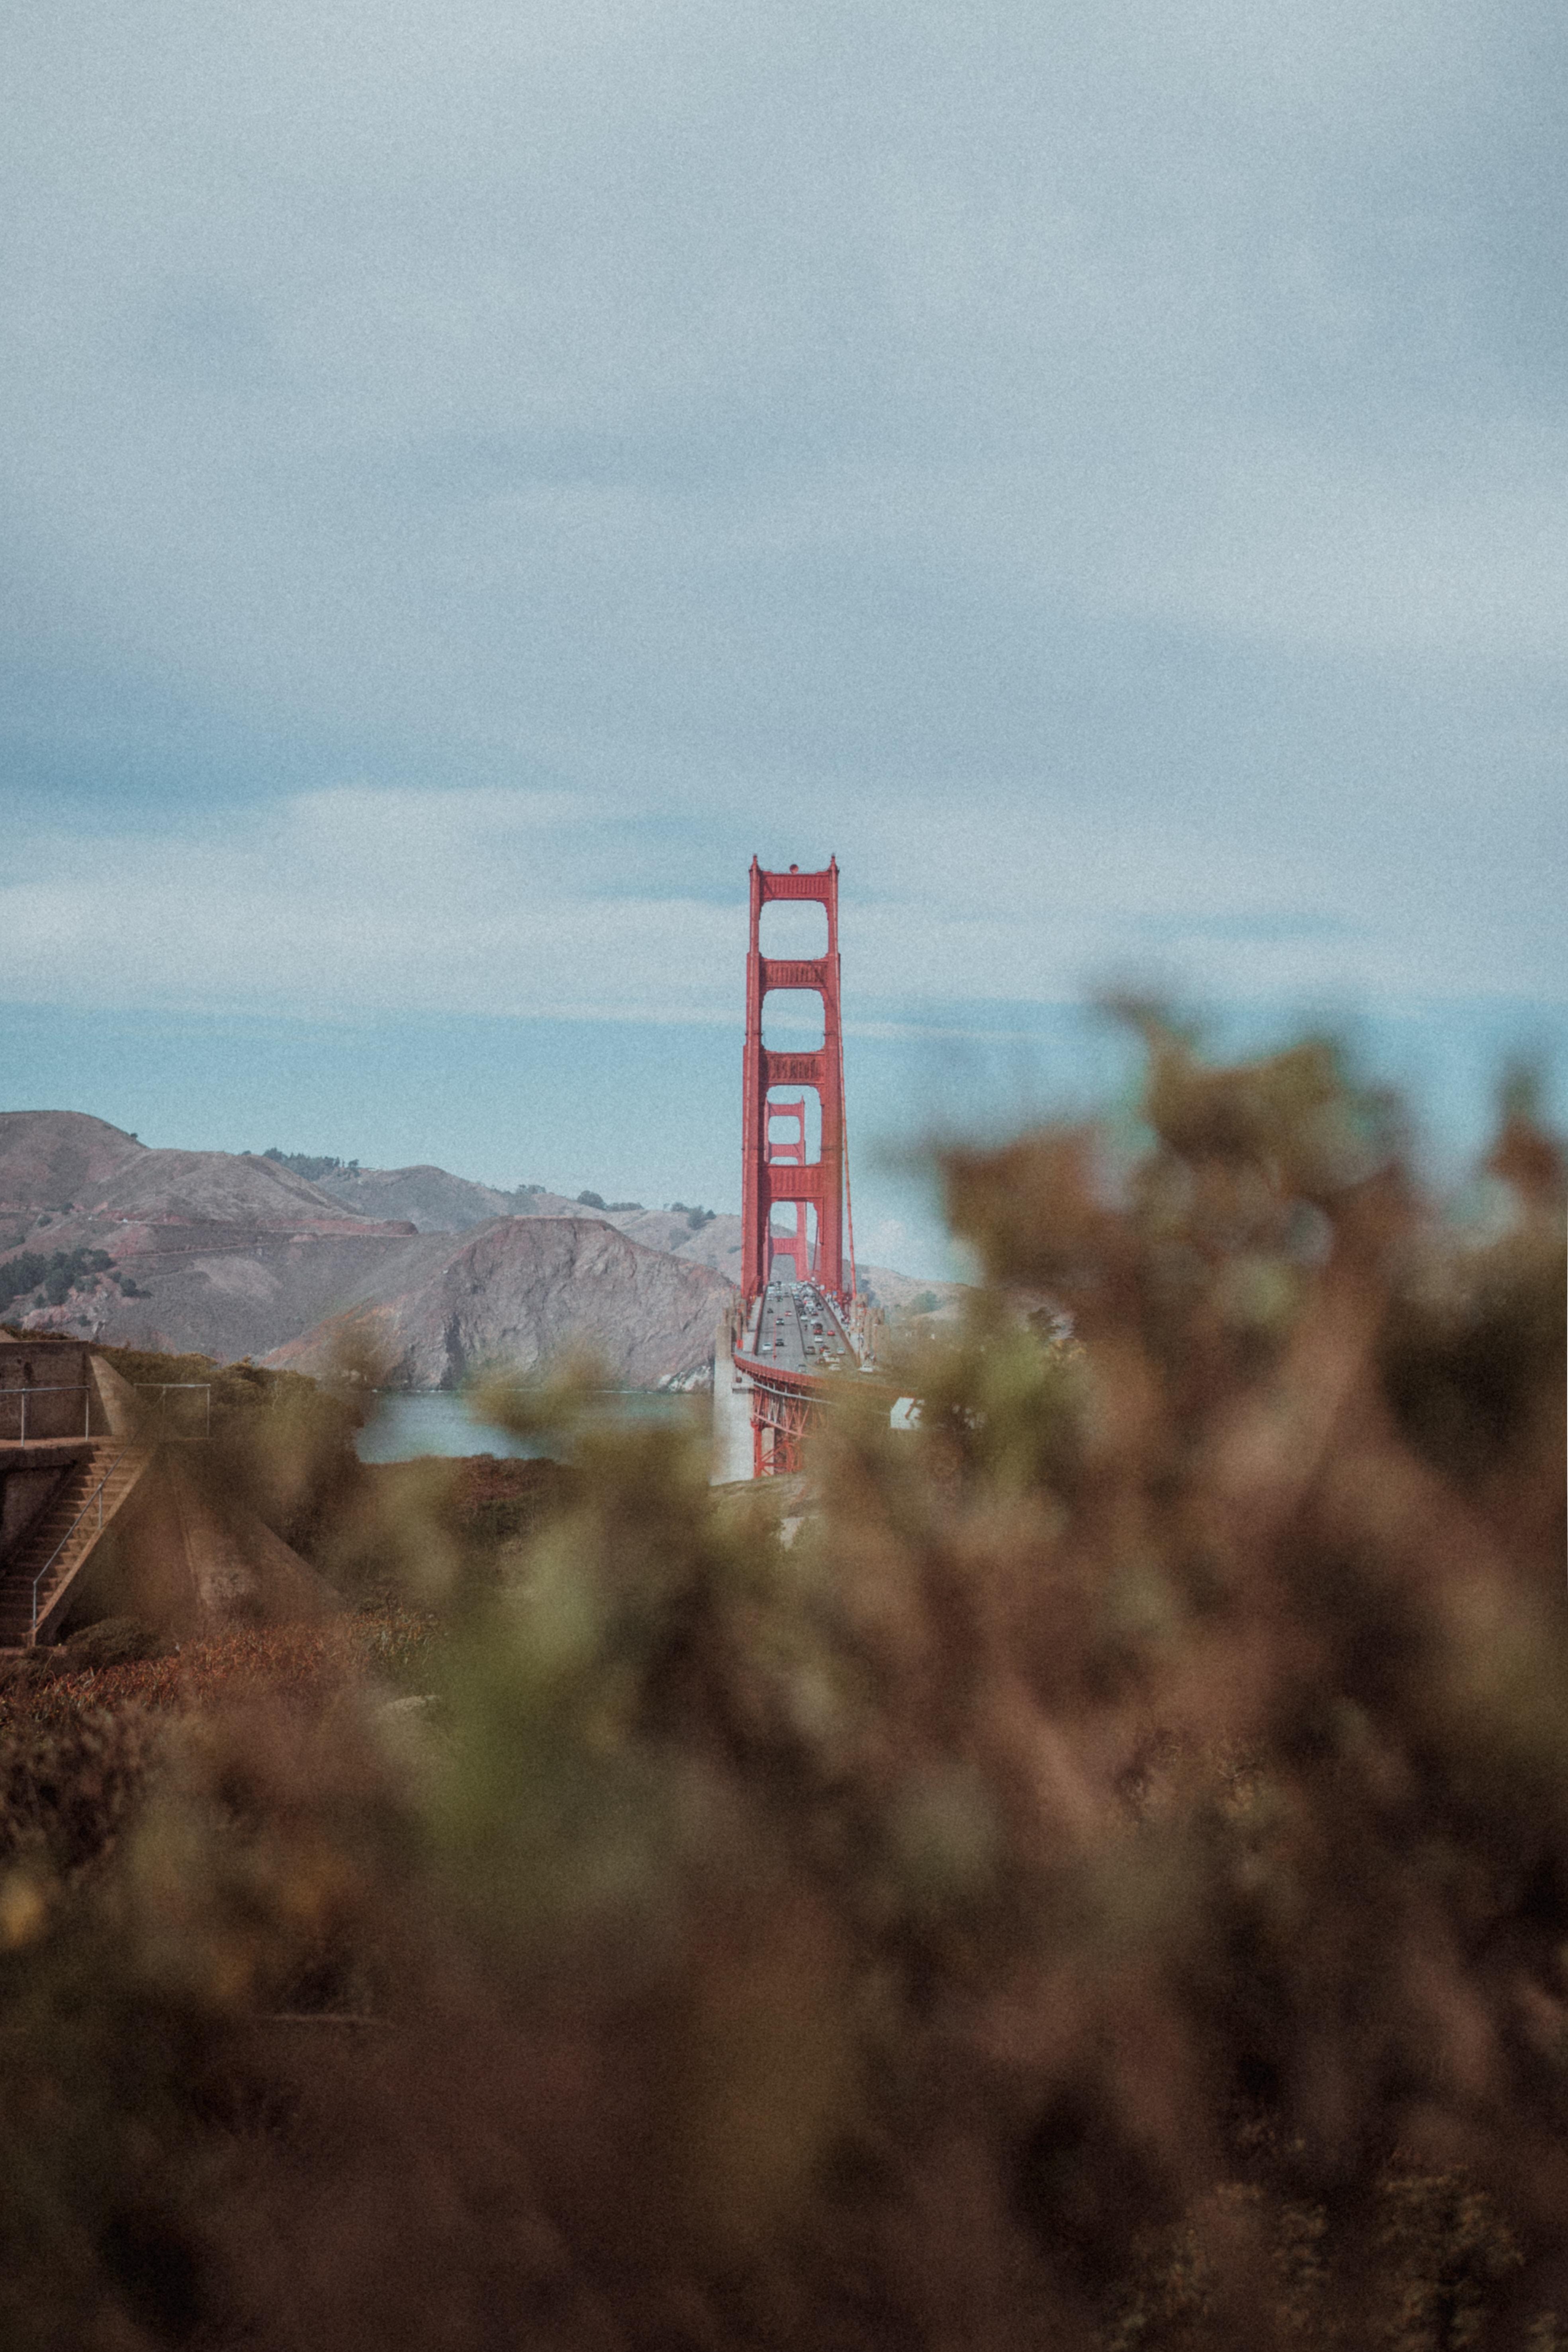 red and white bridge during daytime